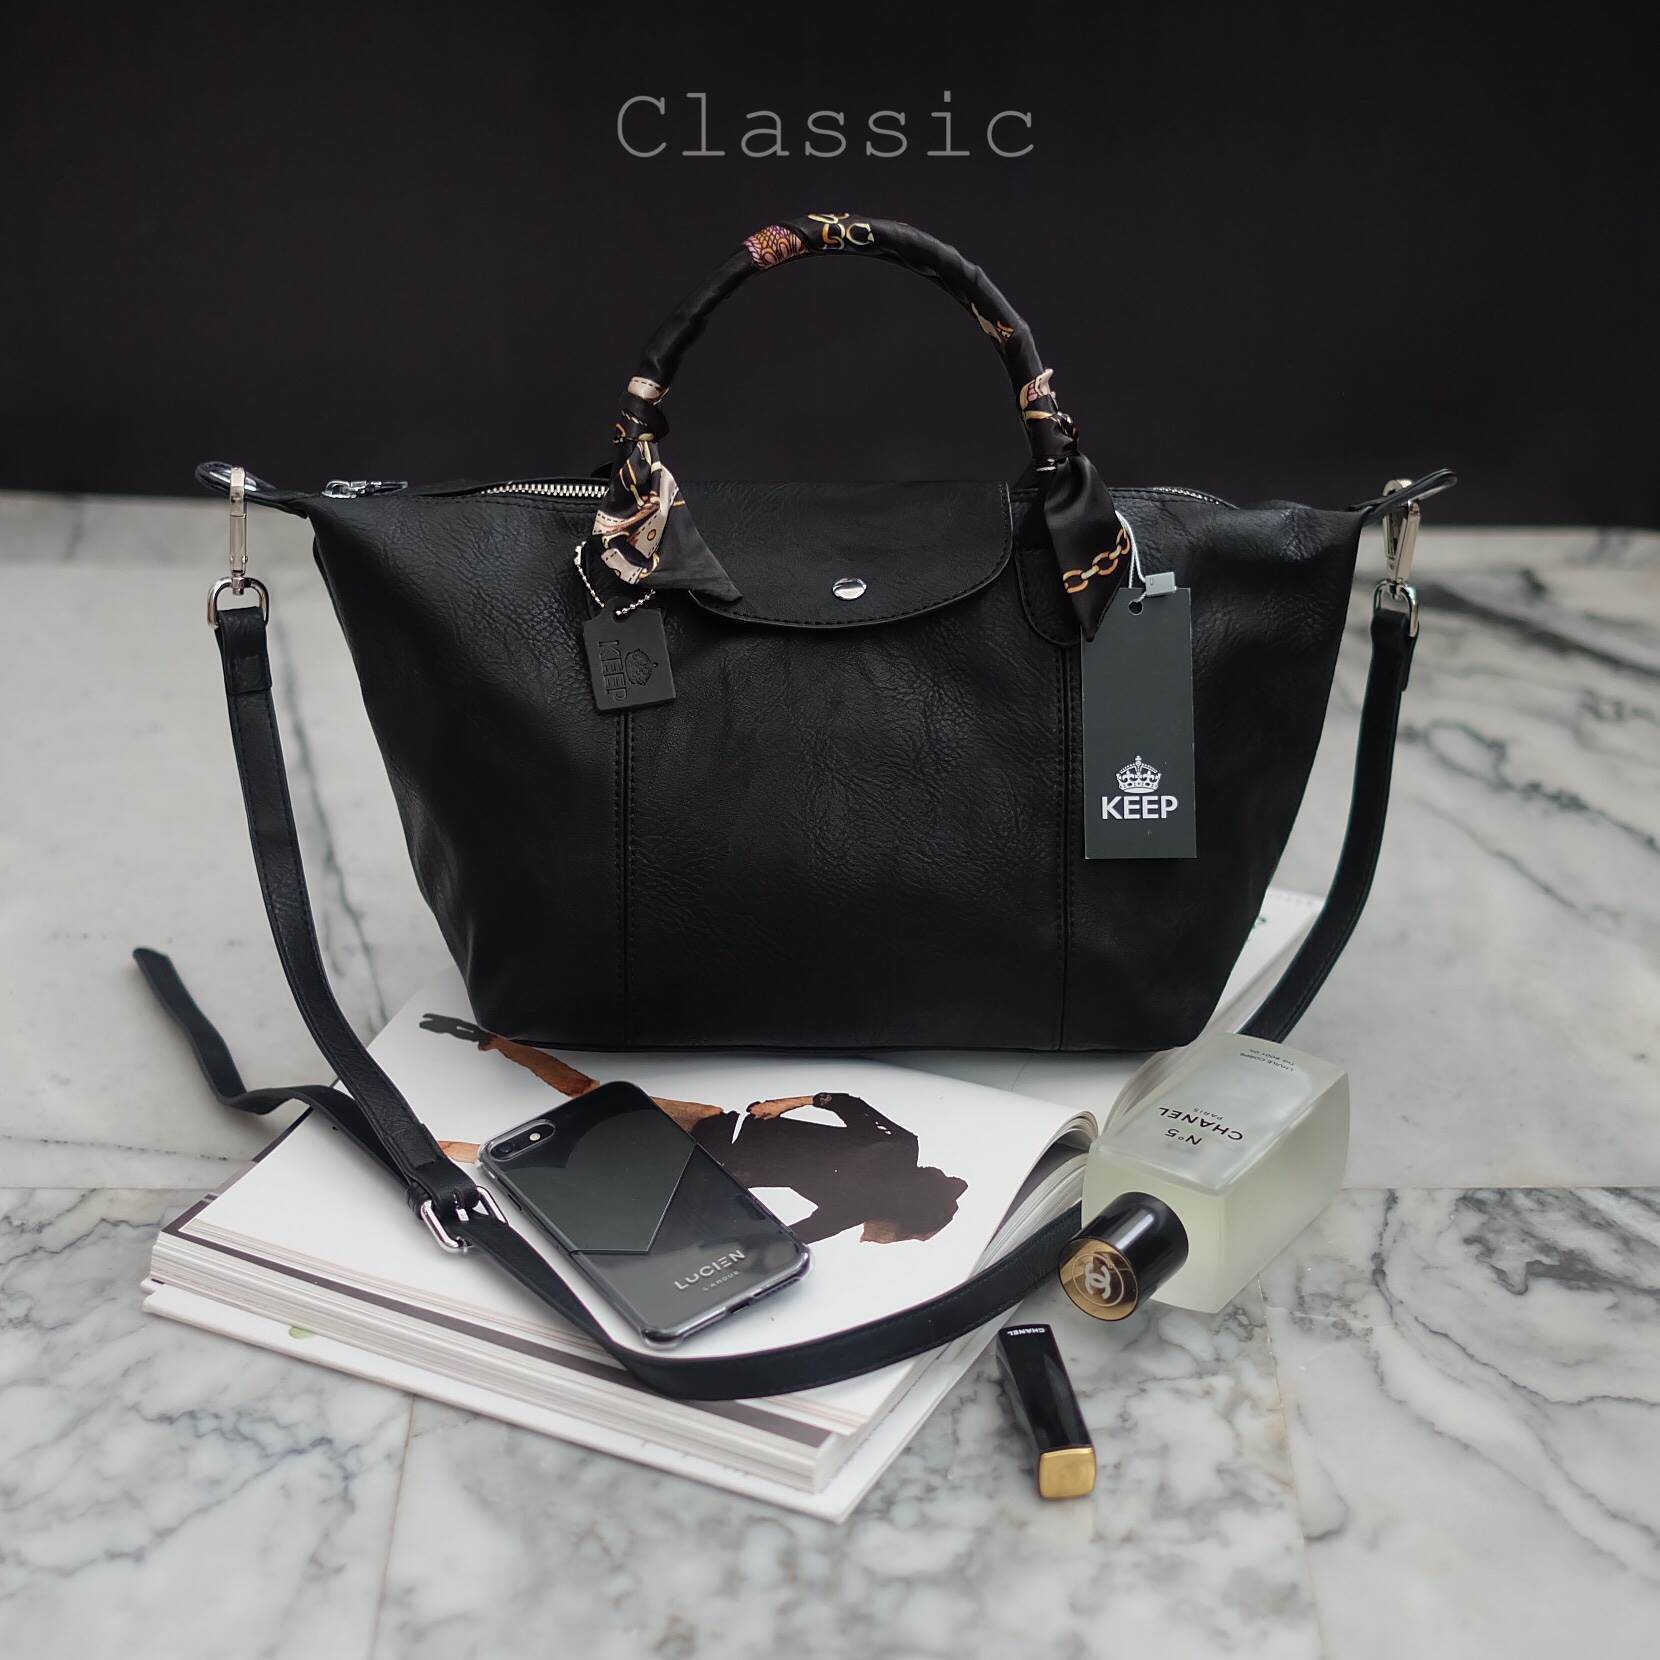 KEEP ทรง longchamp รุ่น Duo Sister-สี Classic black